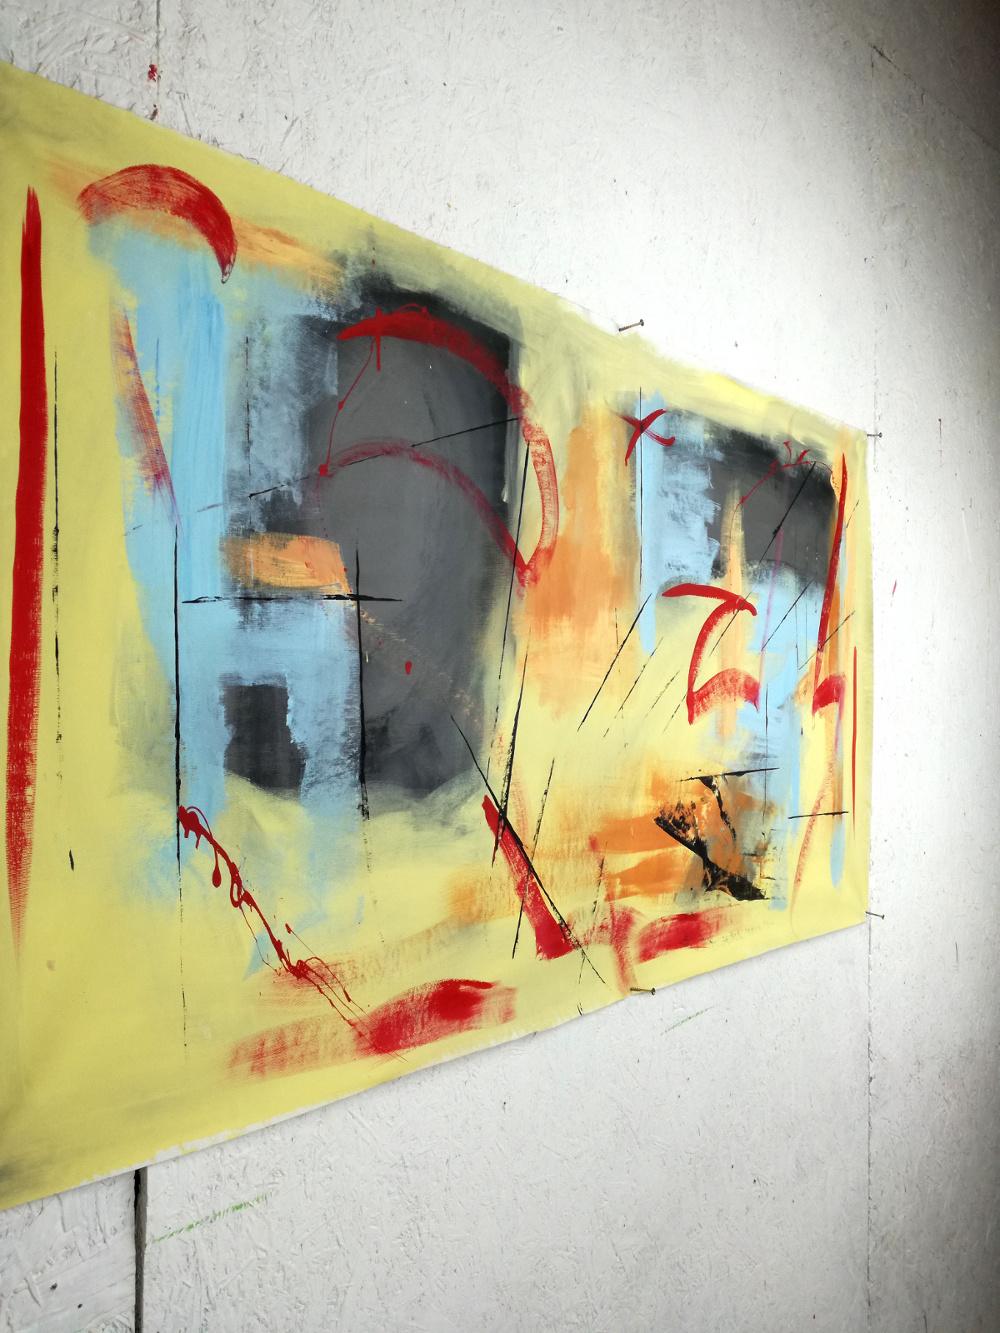 dipinti astratti modernidx b39 - dipinti moderni fatti a mano 120x60